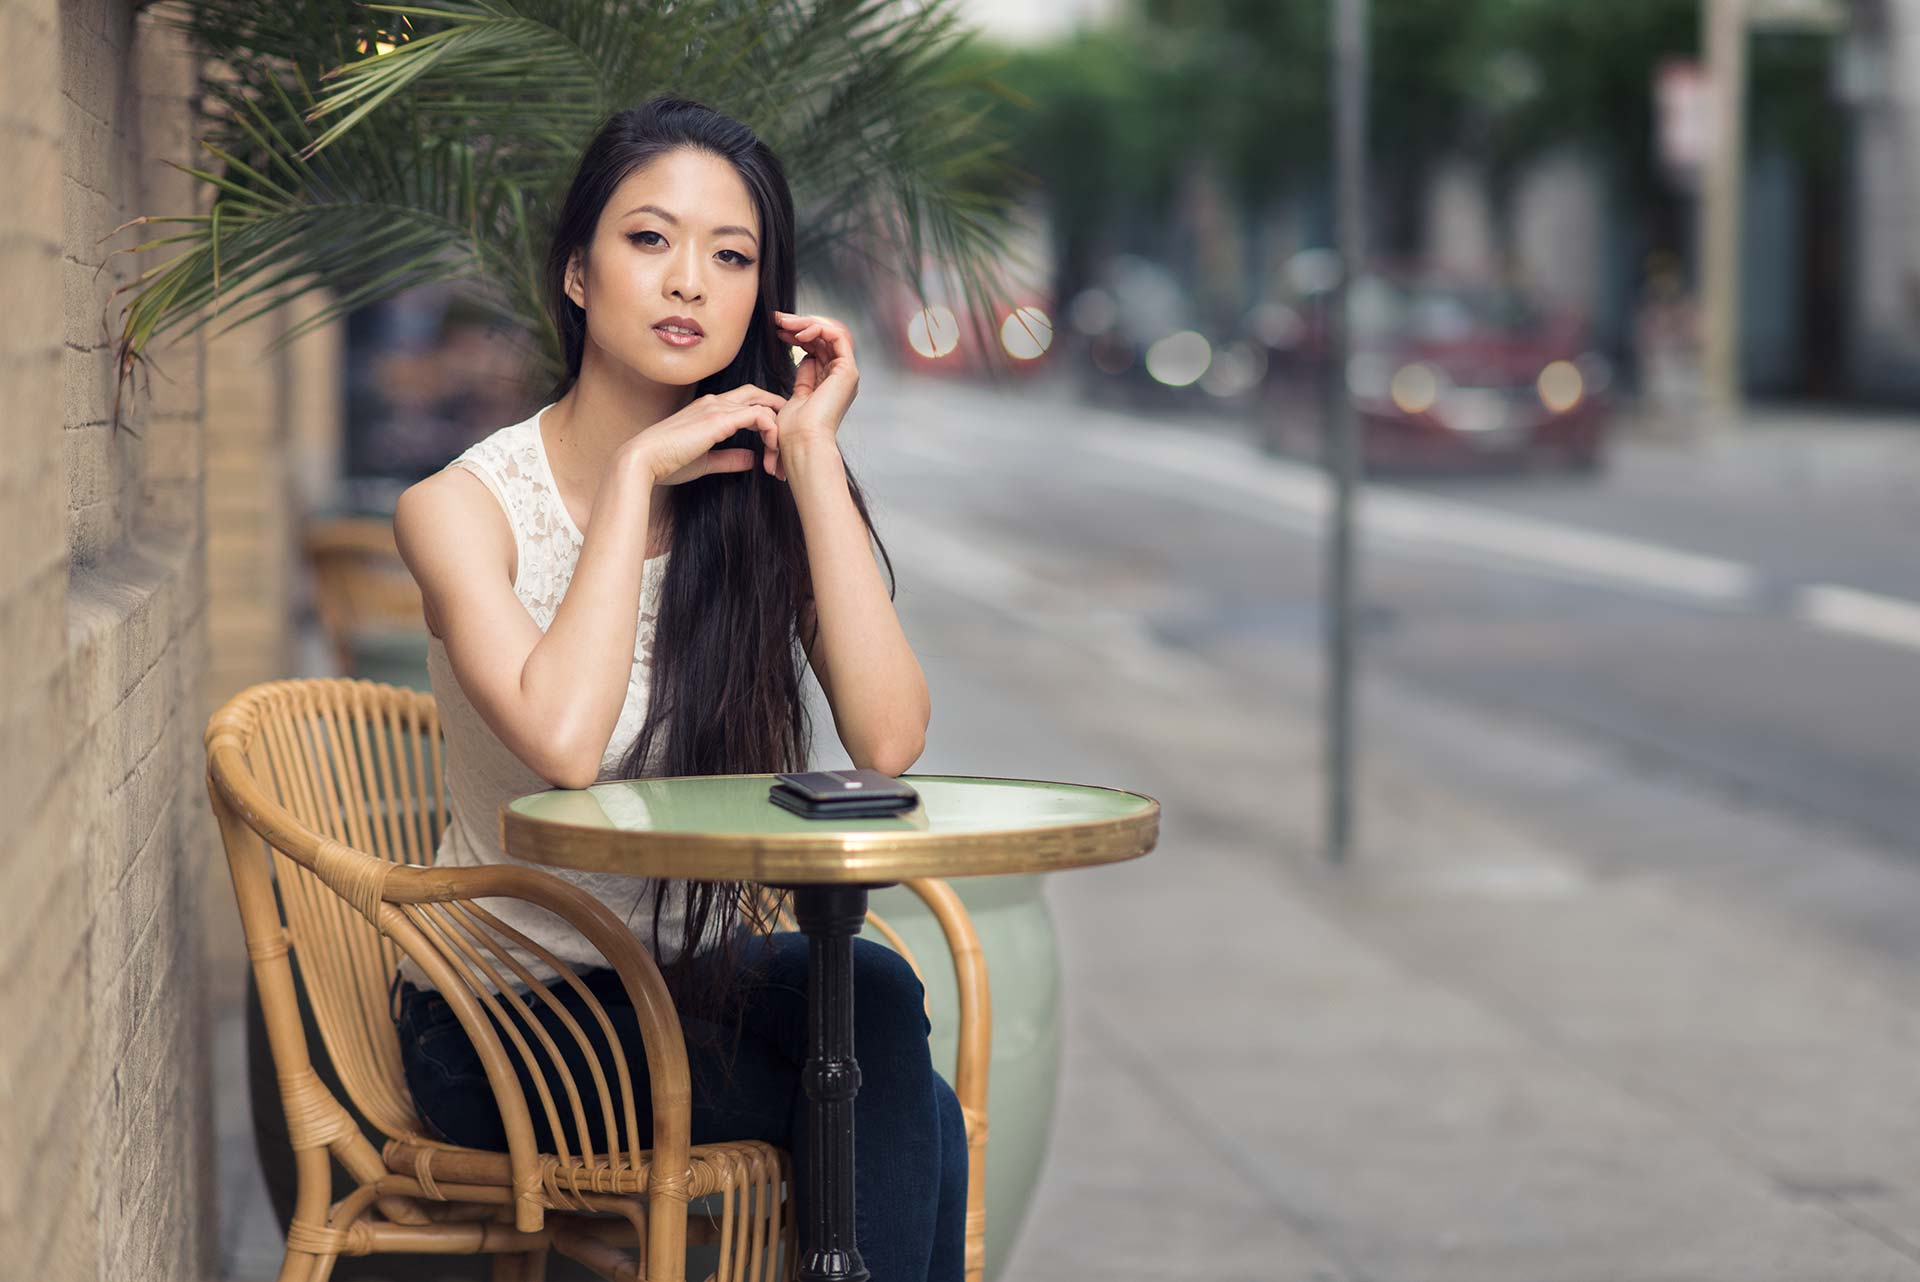 Portrait & headshot photography. Model Credit: CC